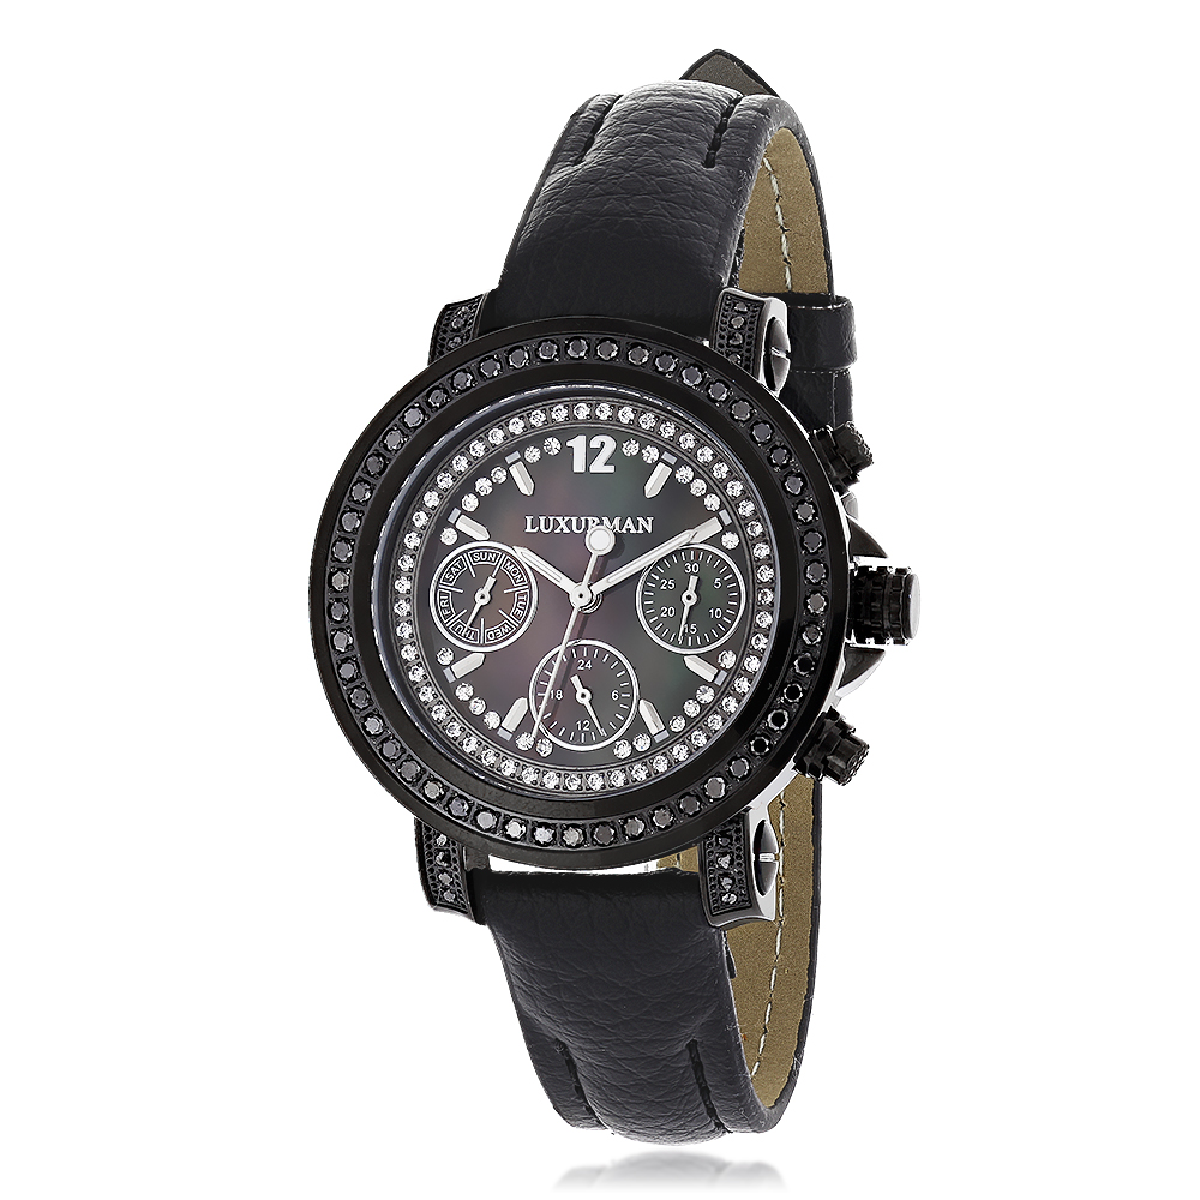 Luxurman Watches: Black Diamond Watch for Women 2.15 carats